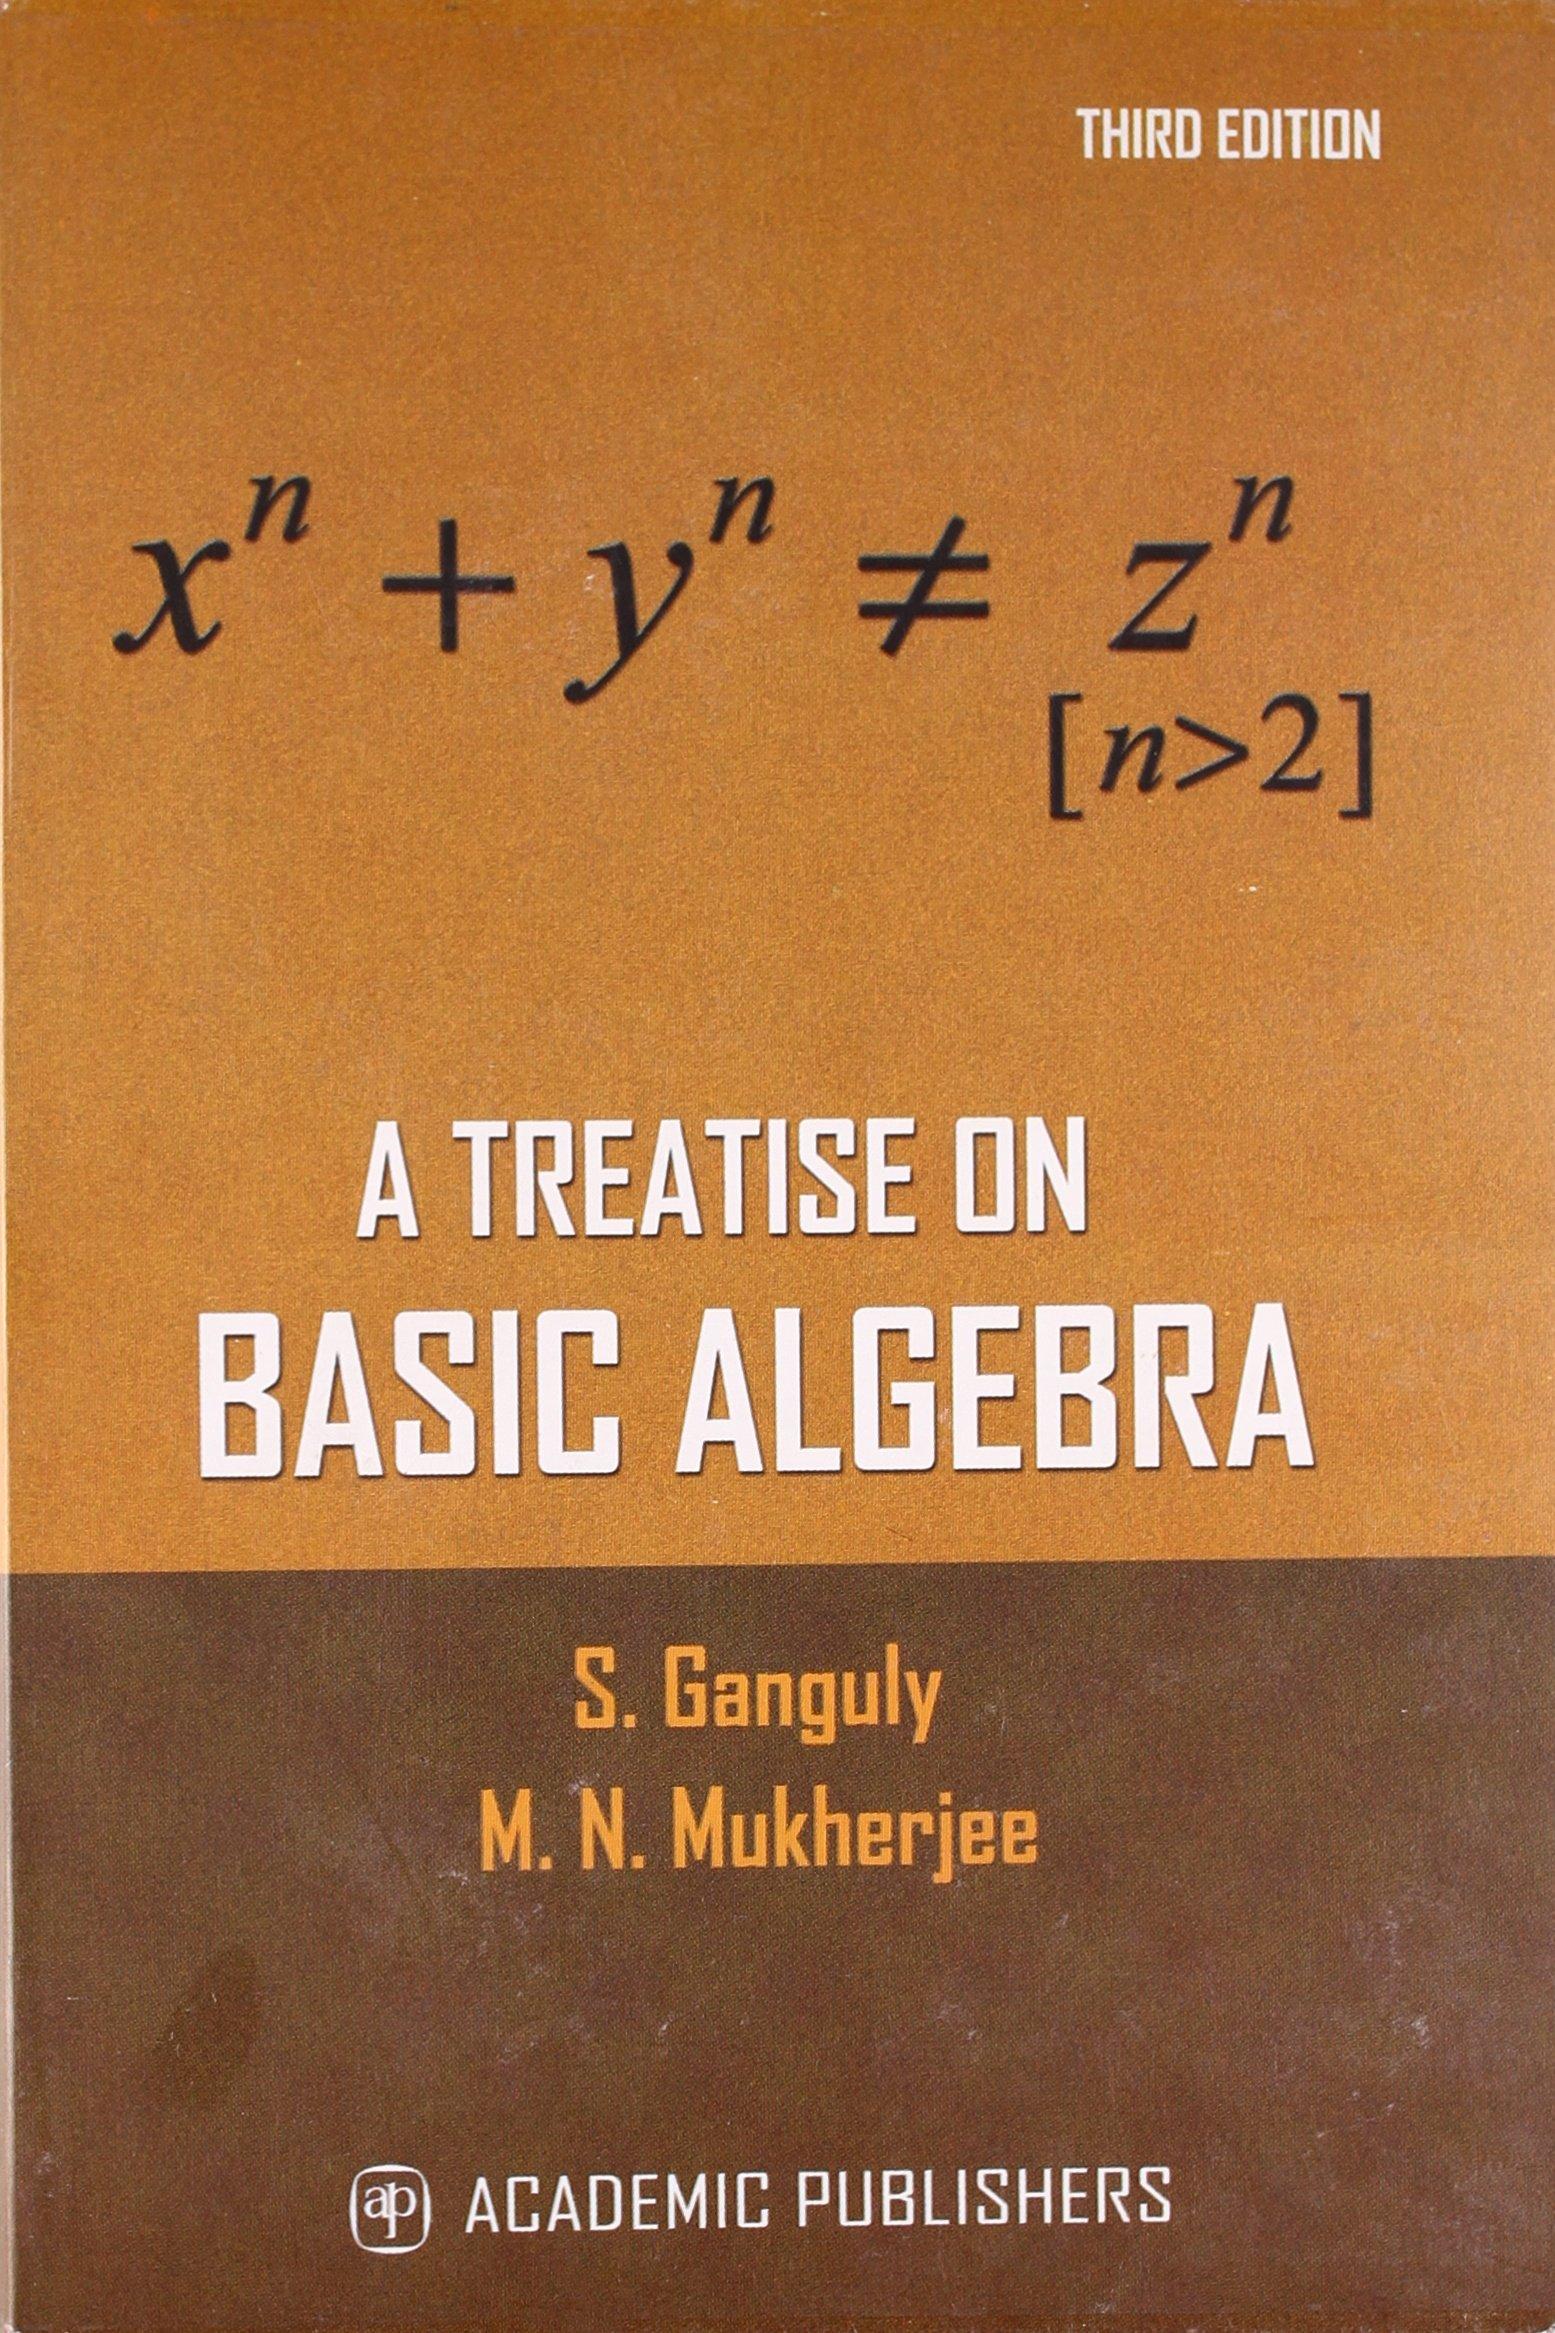 A TREATISE ON BASIC ALGEBRA ebook